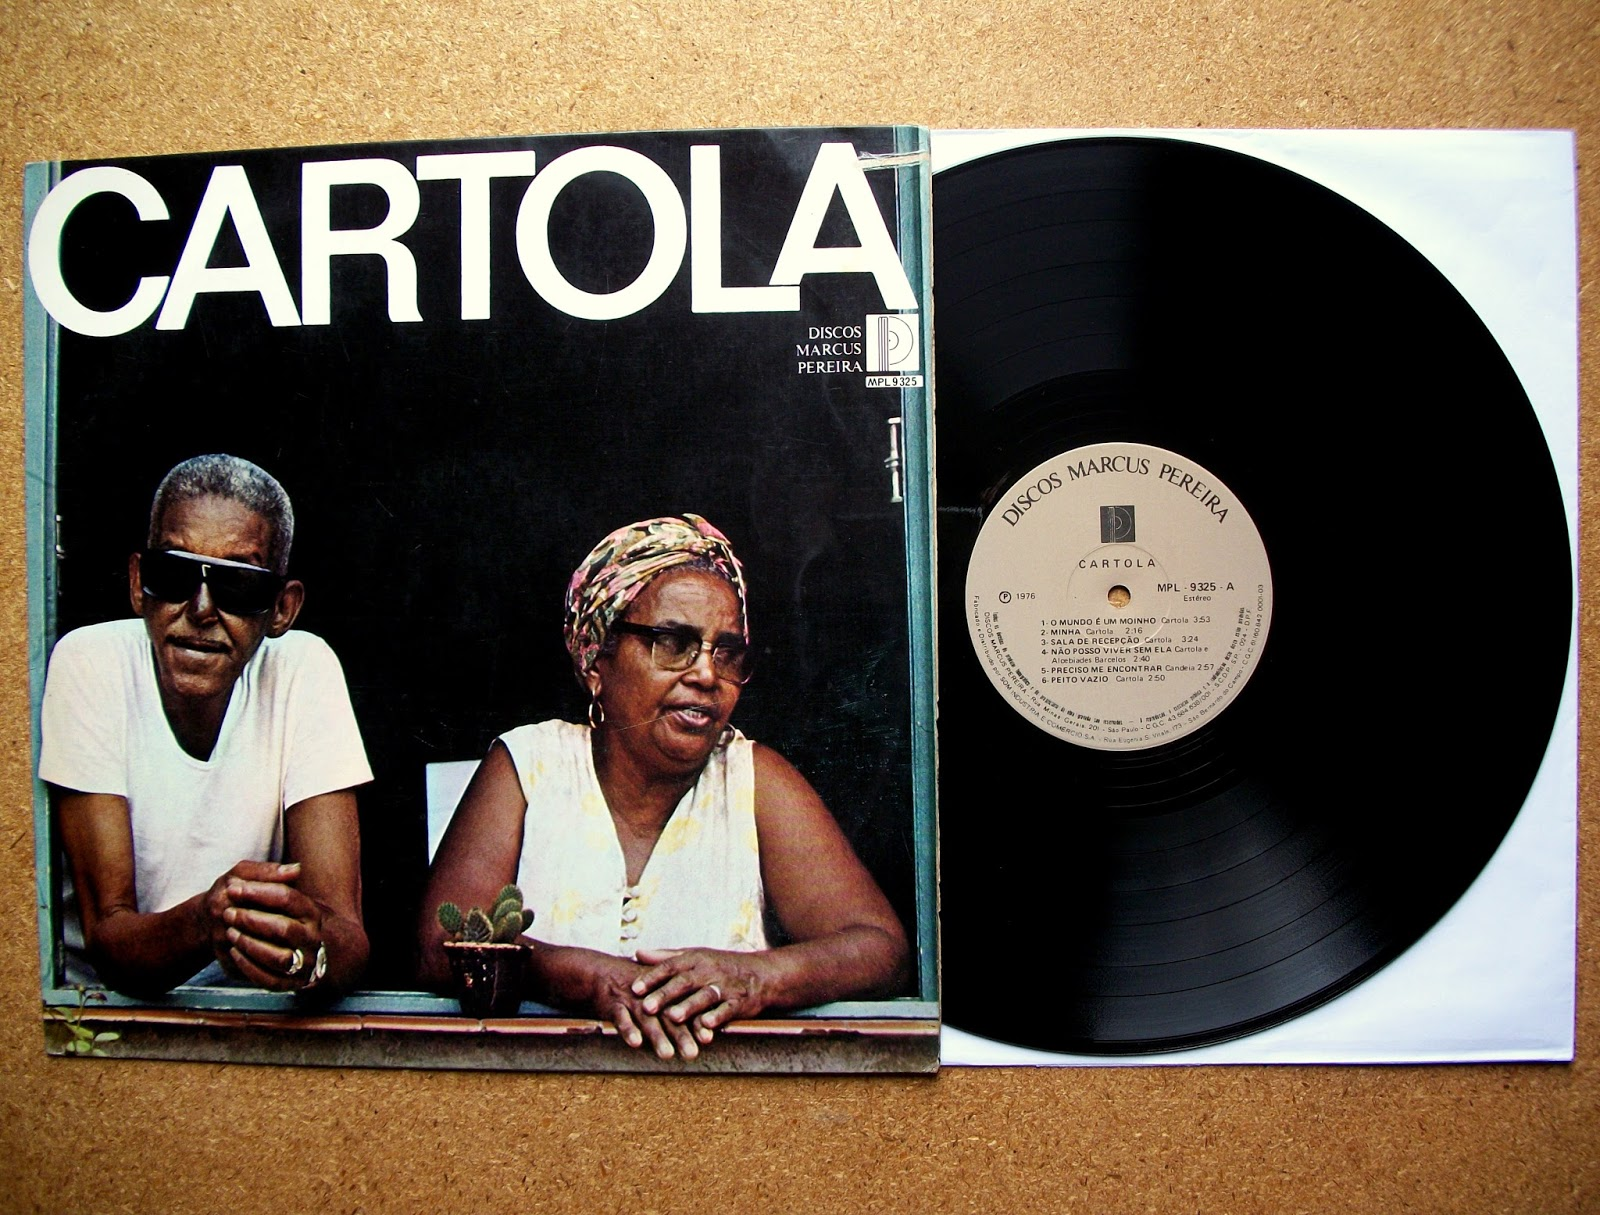 1976 BAIXAR CARTOLA